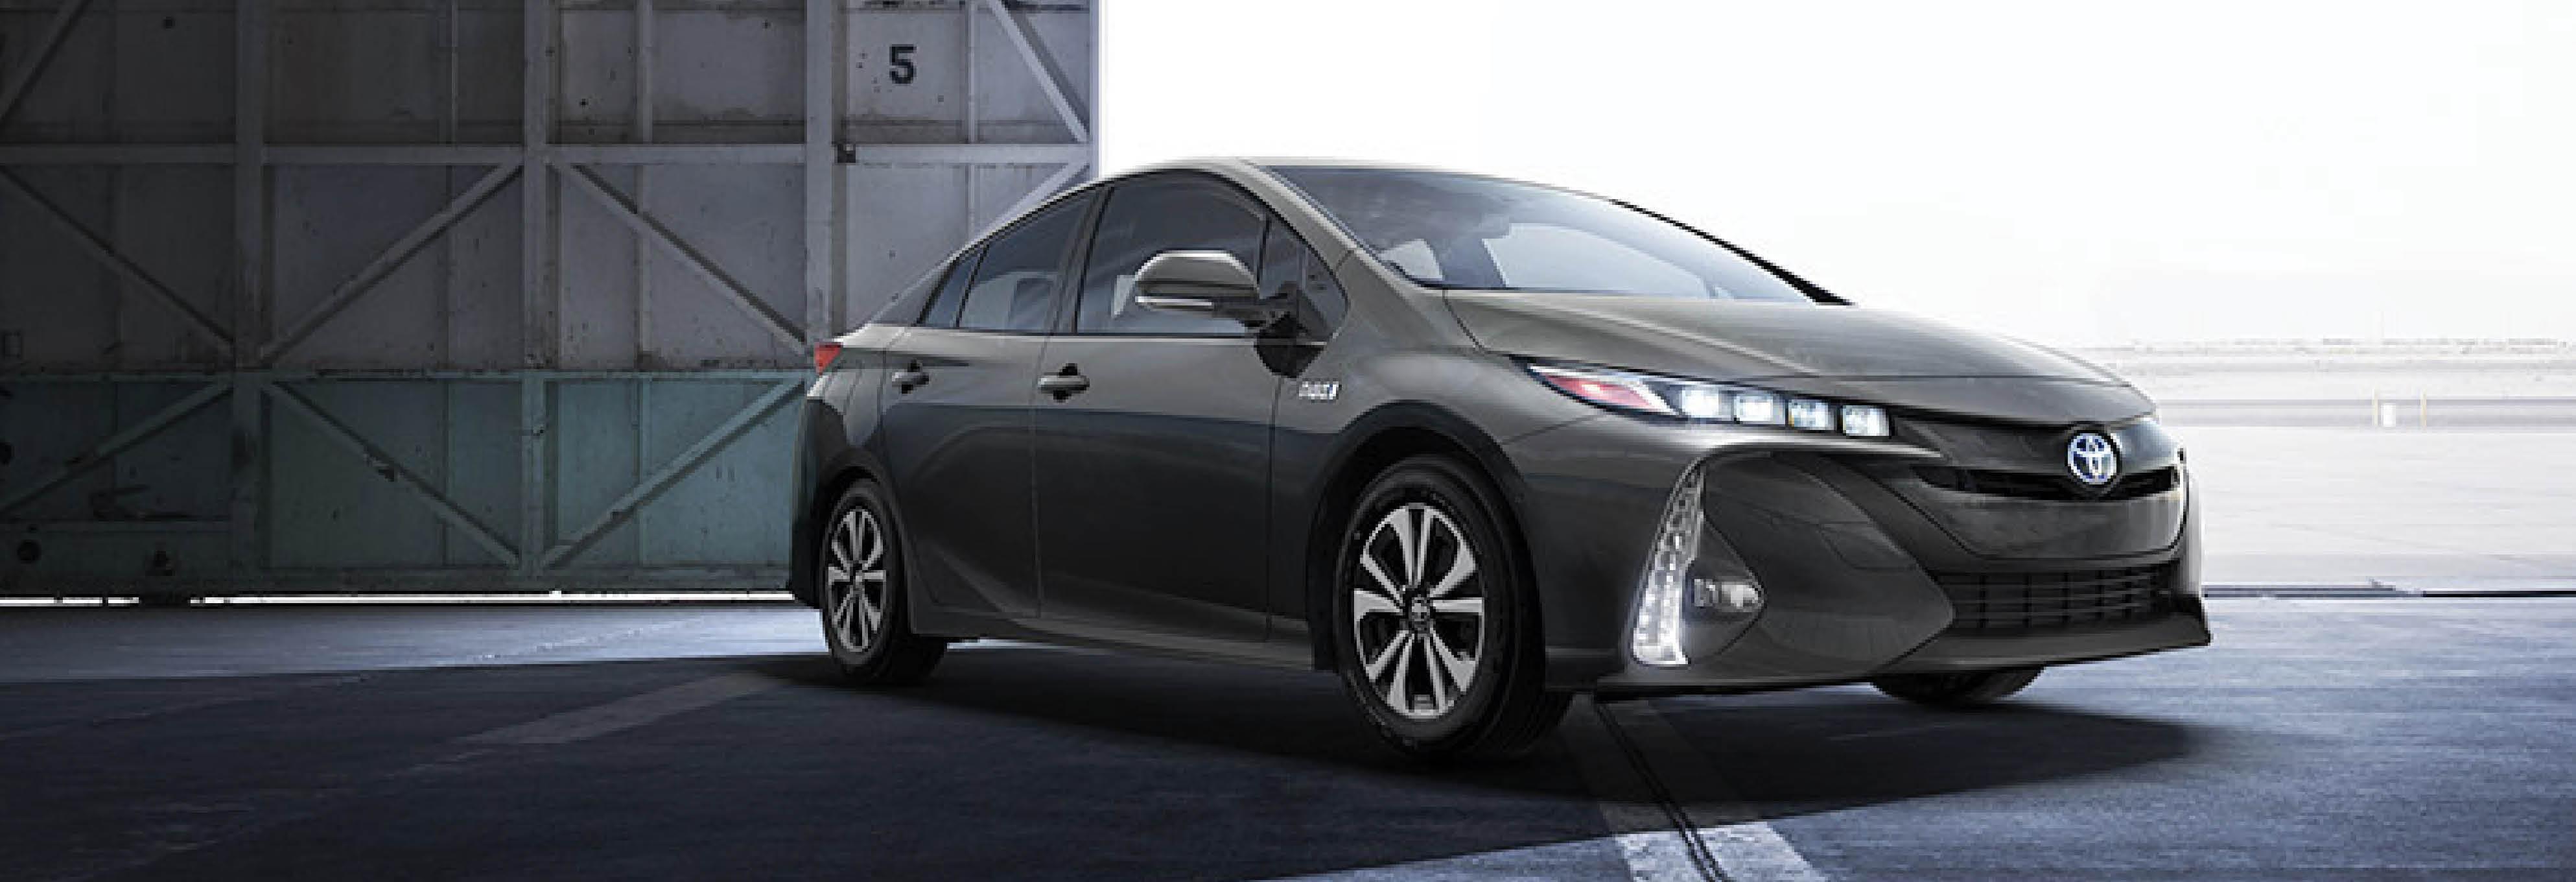 Team Toyota princeton, nj , toyota, new car, used car, preowned, car deals, discounts